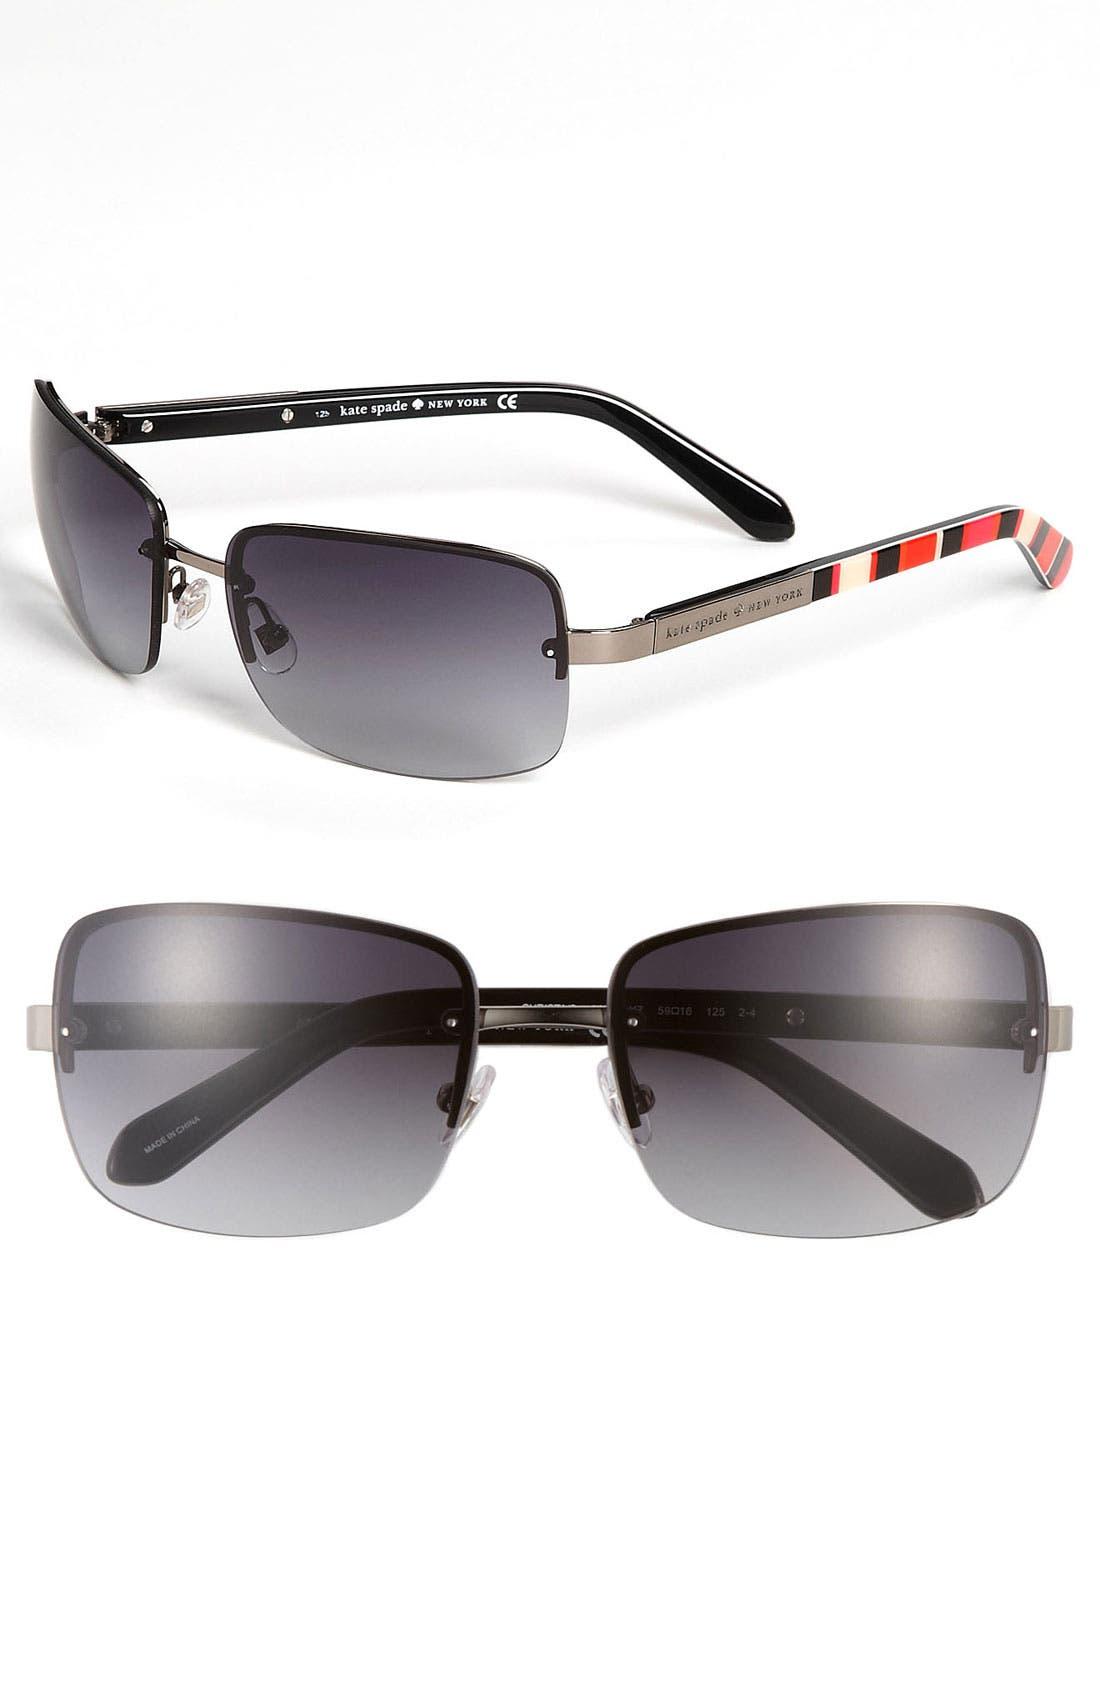 Main Image - kate spade new york 'christa' 59mm rimless sunglasses